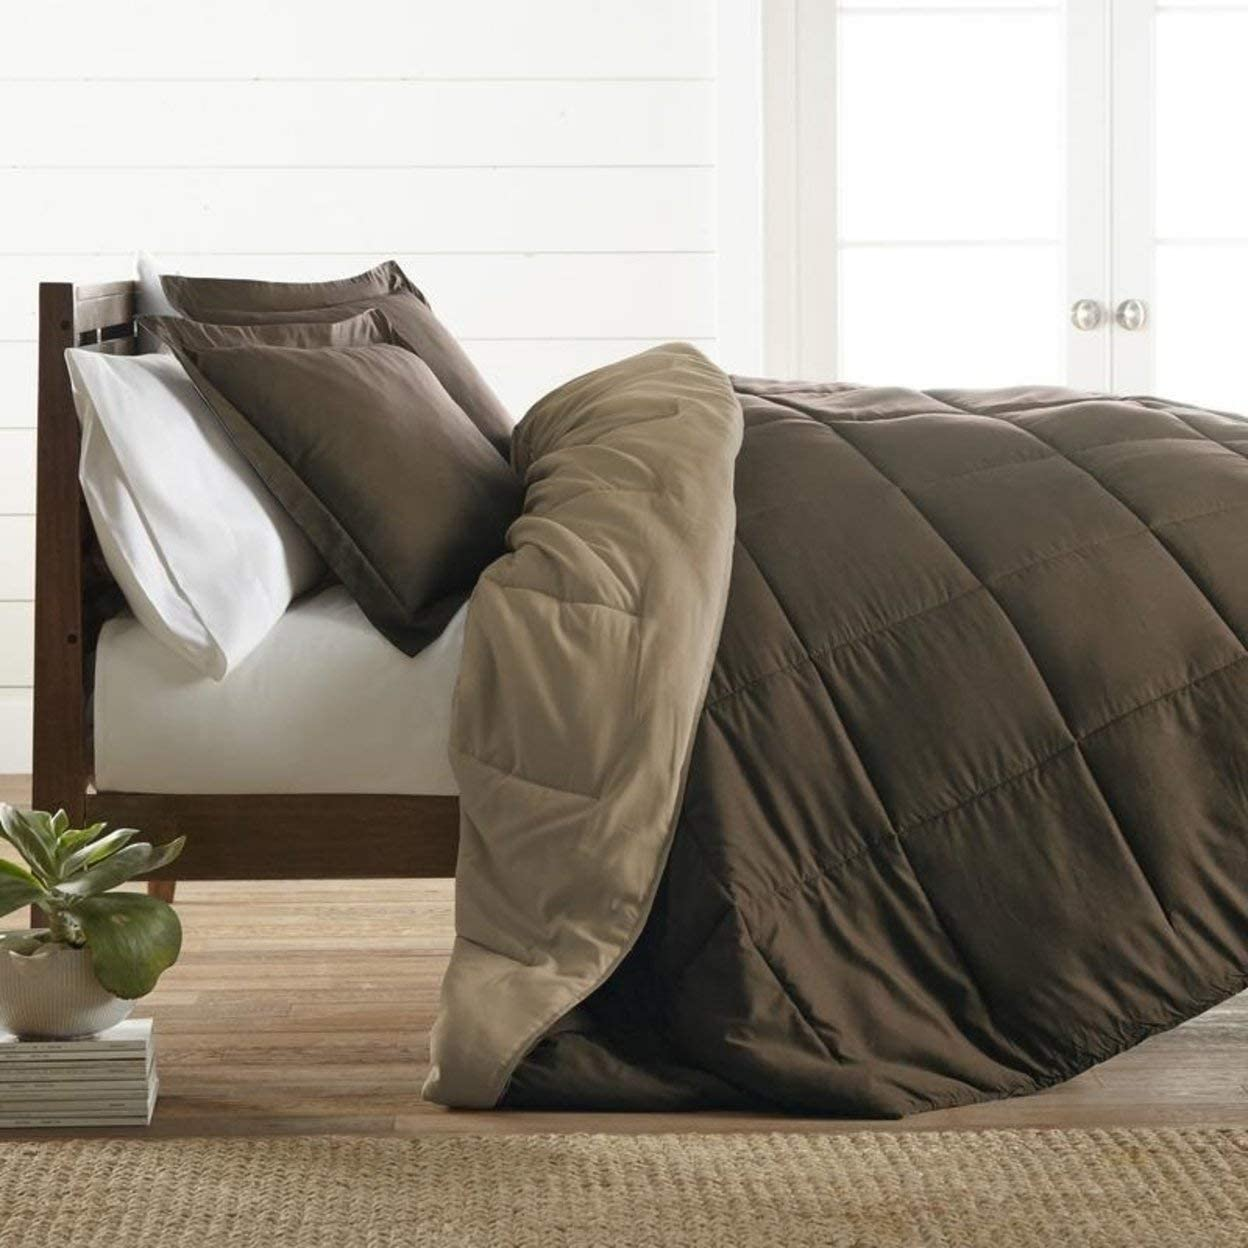 ienjoy Home Premium Down Alternative Reversible Comforter Set, King/Cal King, Taupe